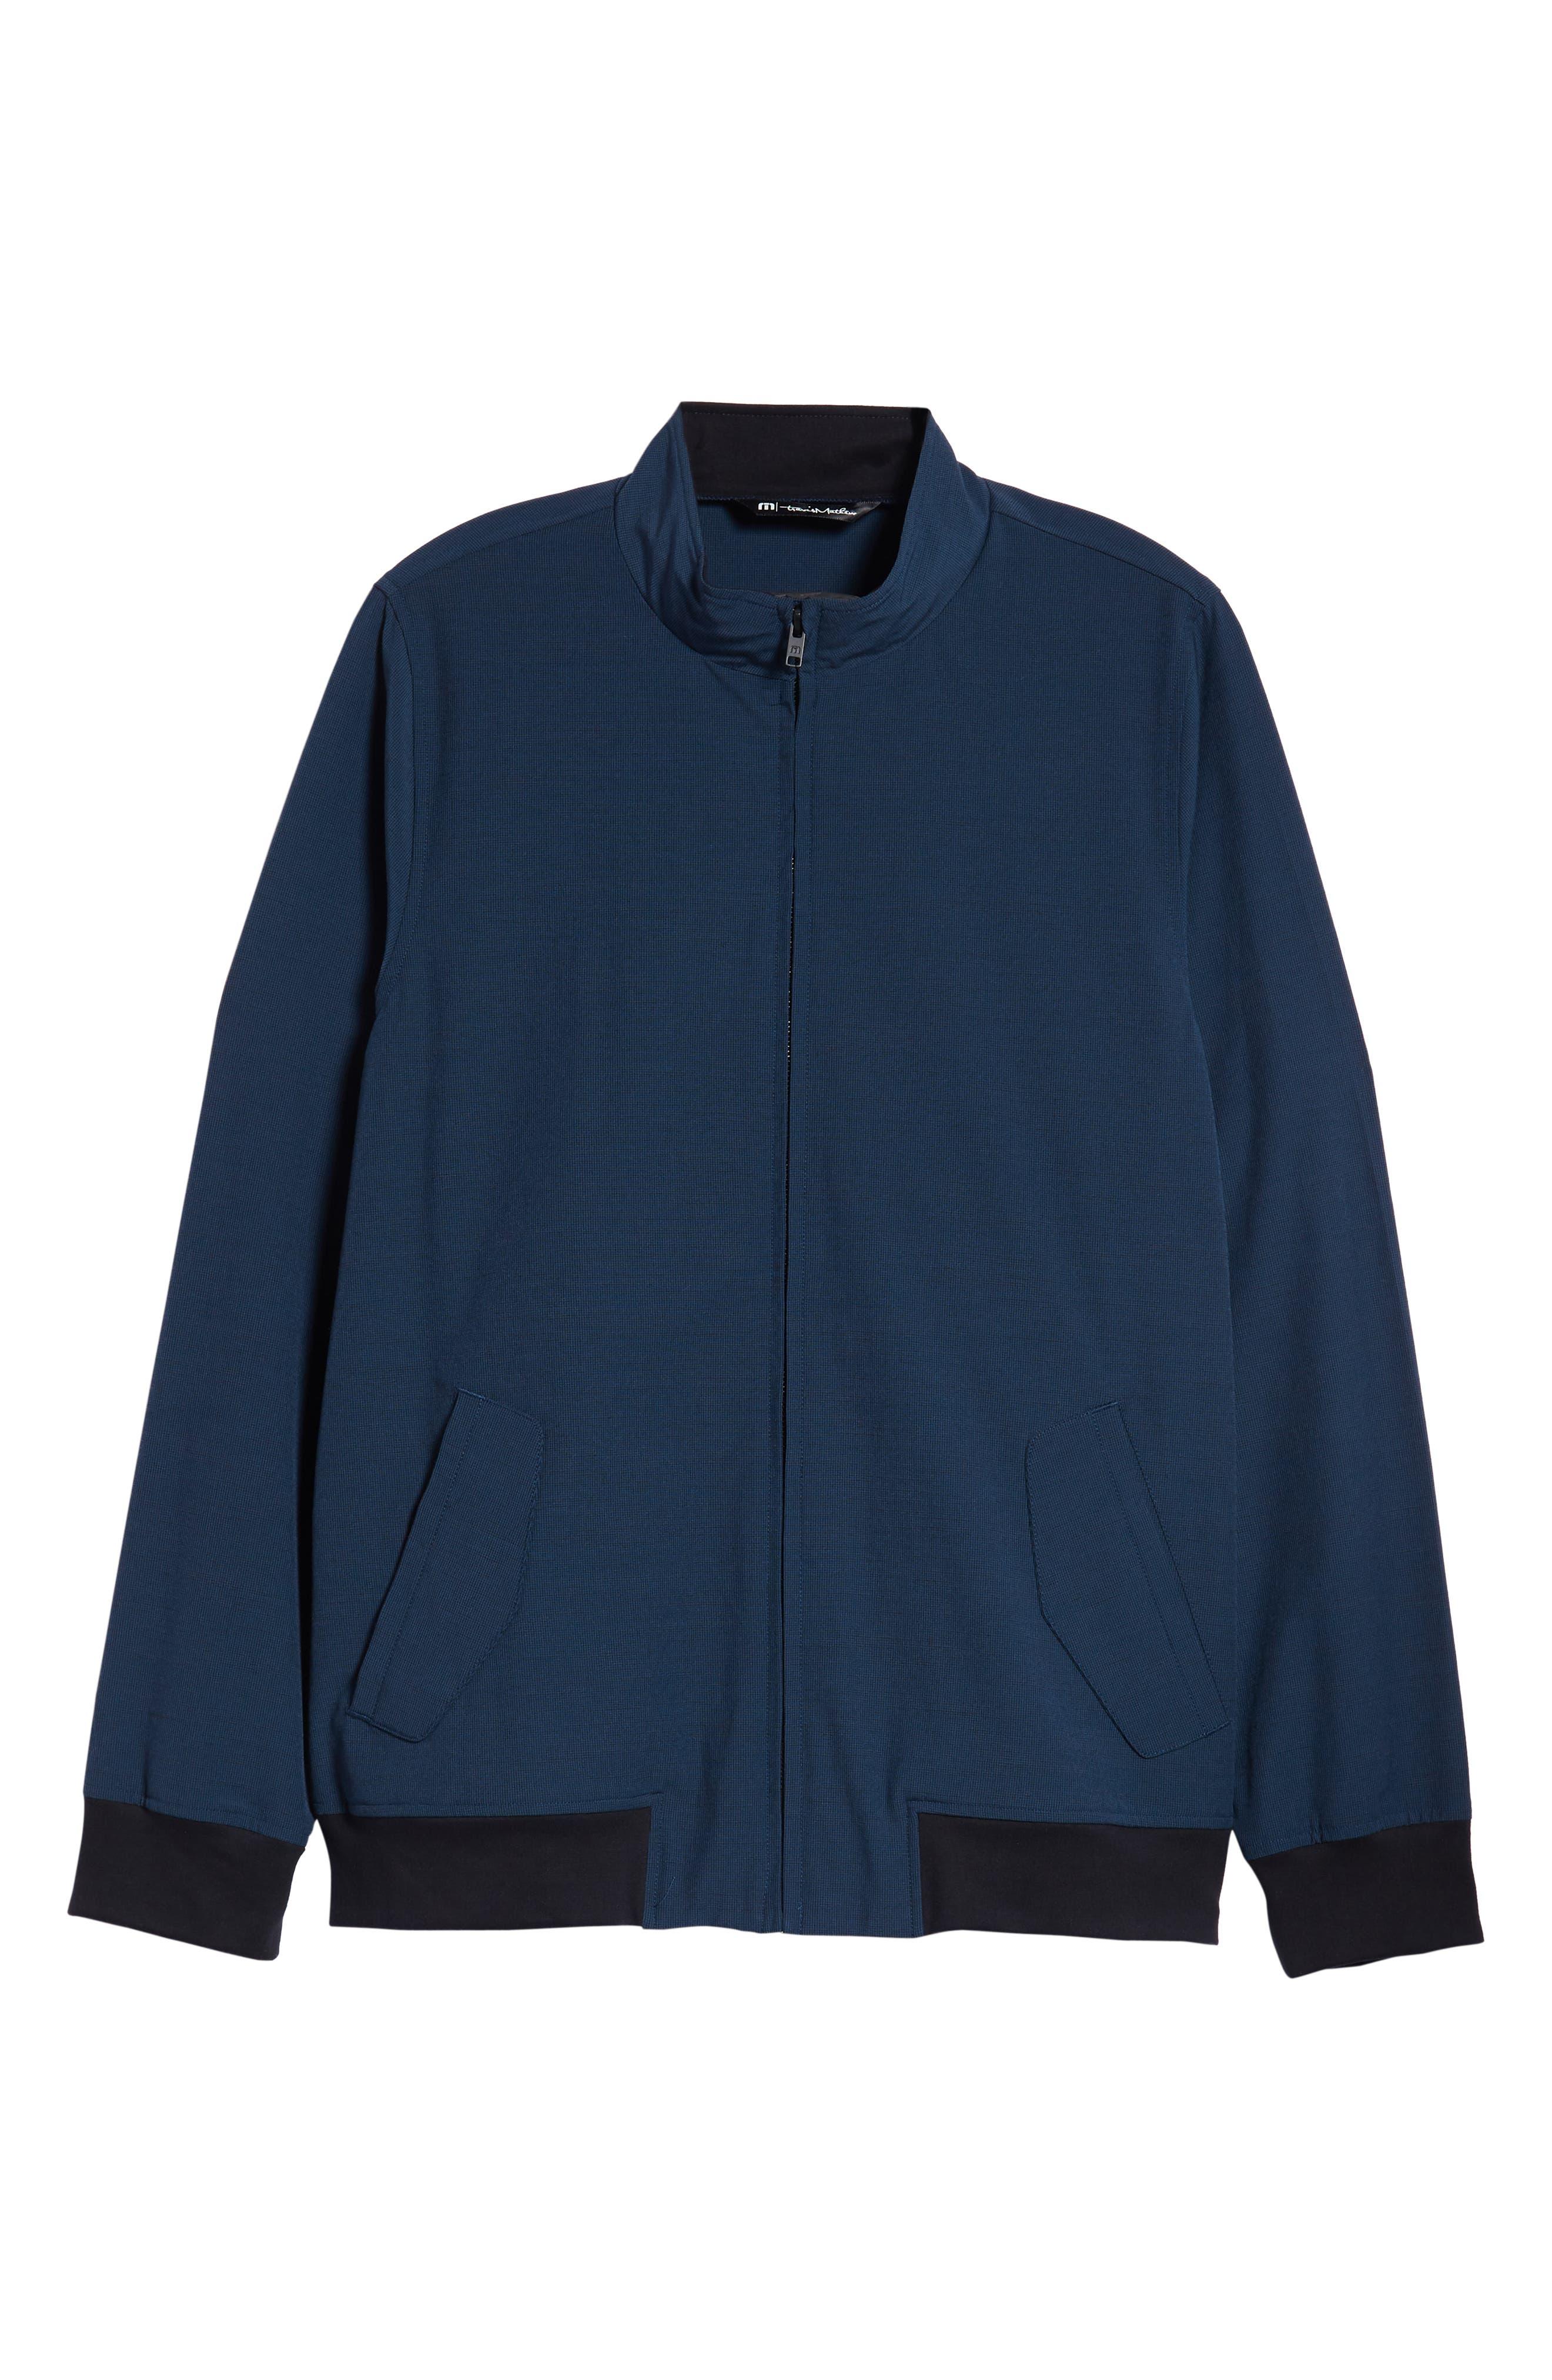 Ridgley Regular Fit Jacket,                             Alternate thumbnail 5, color,                             BLUE WING TEAL/ BLACK